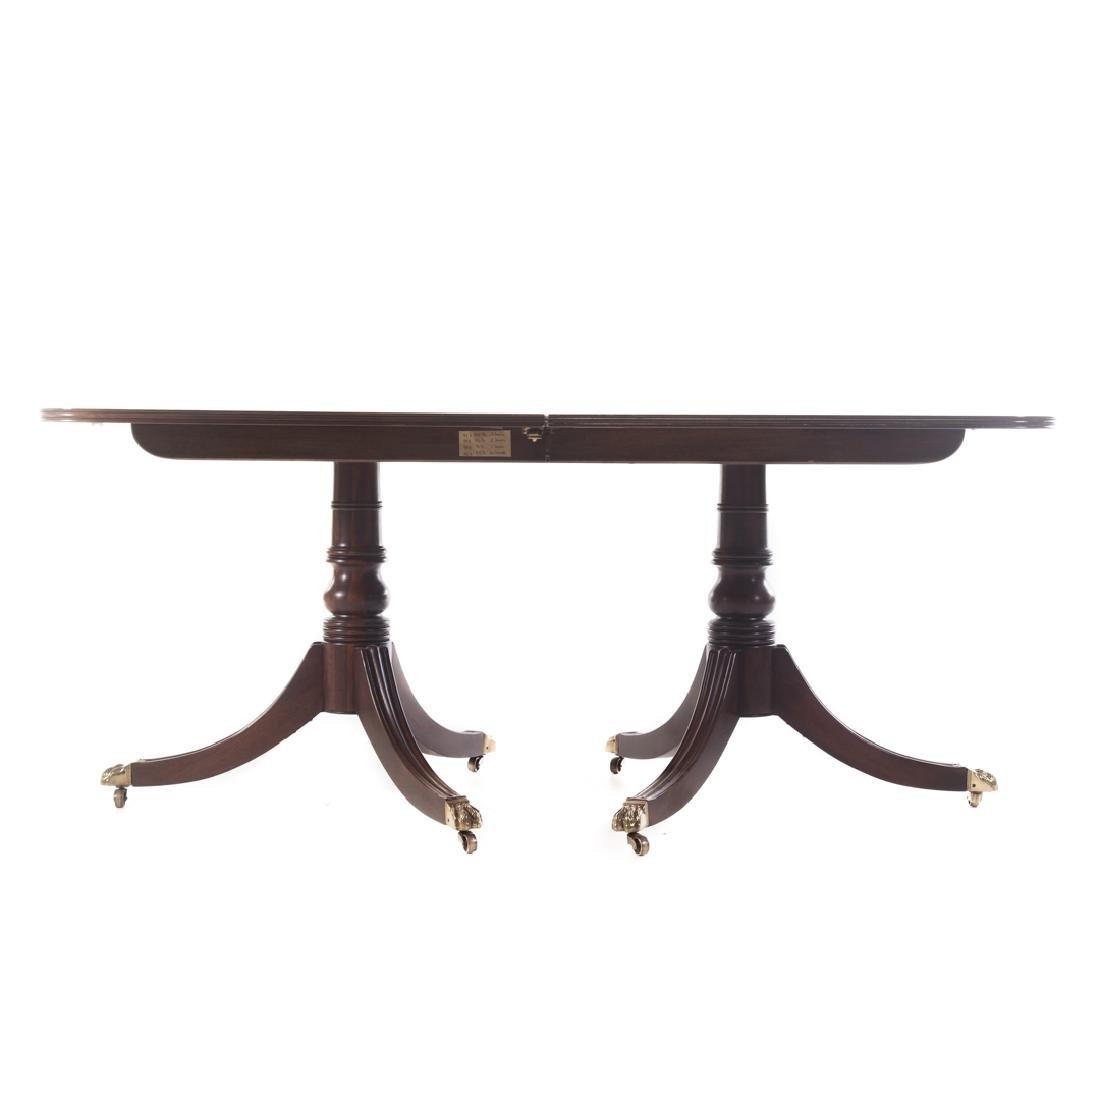 Henredon George III style walnut dining table